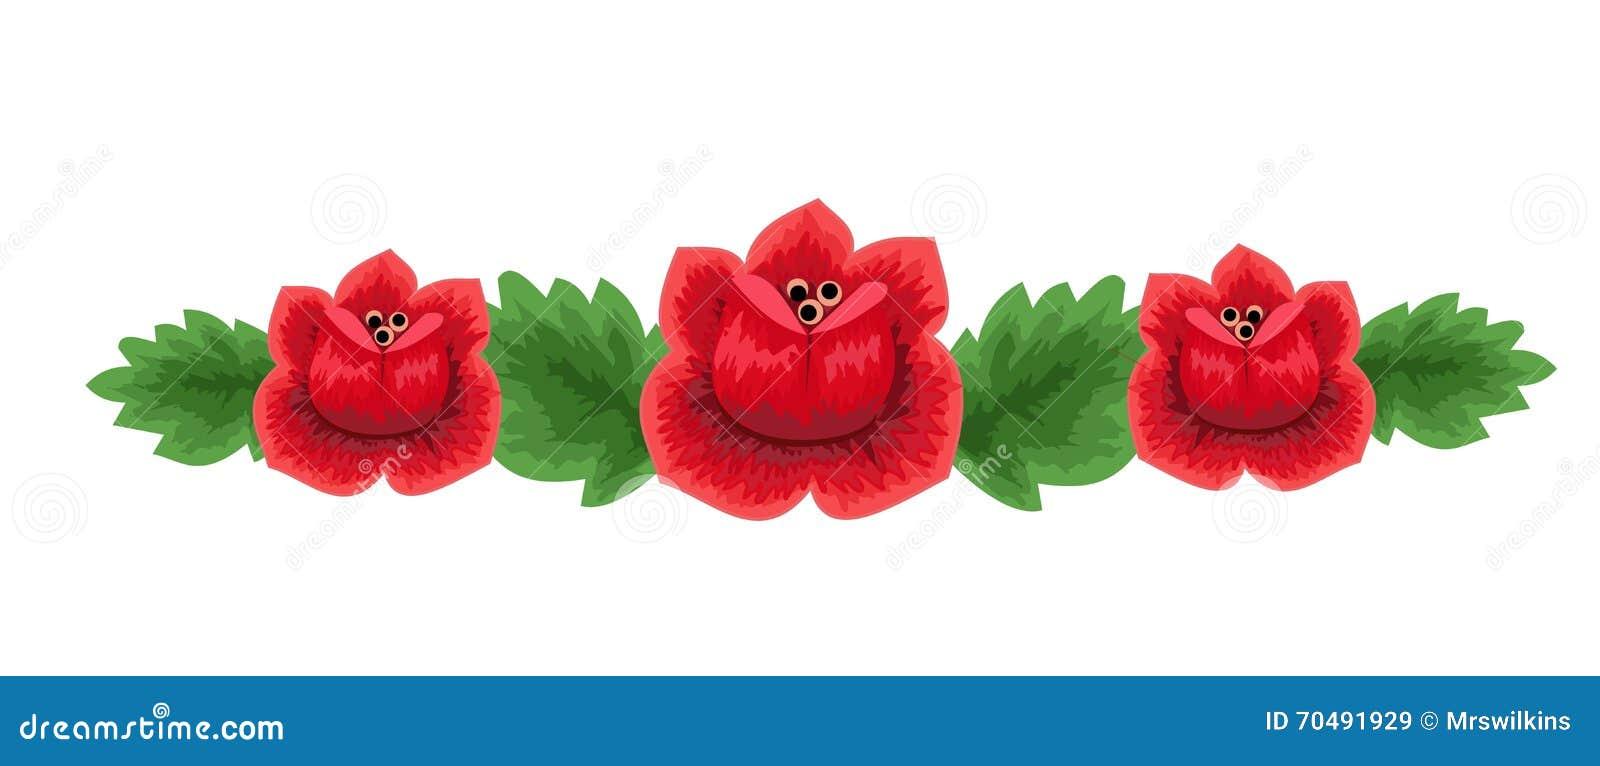 Traditional folk floral pattern illustration stock illustration download traditional folk floral pattern illustration stock illustration illustration of colorful ornament 70491929 izmirmasajfo